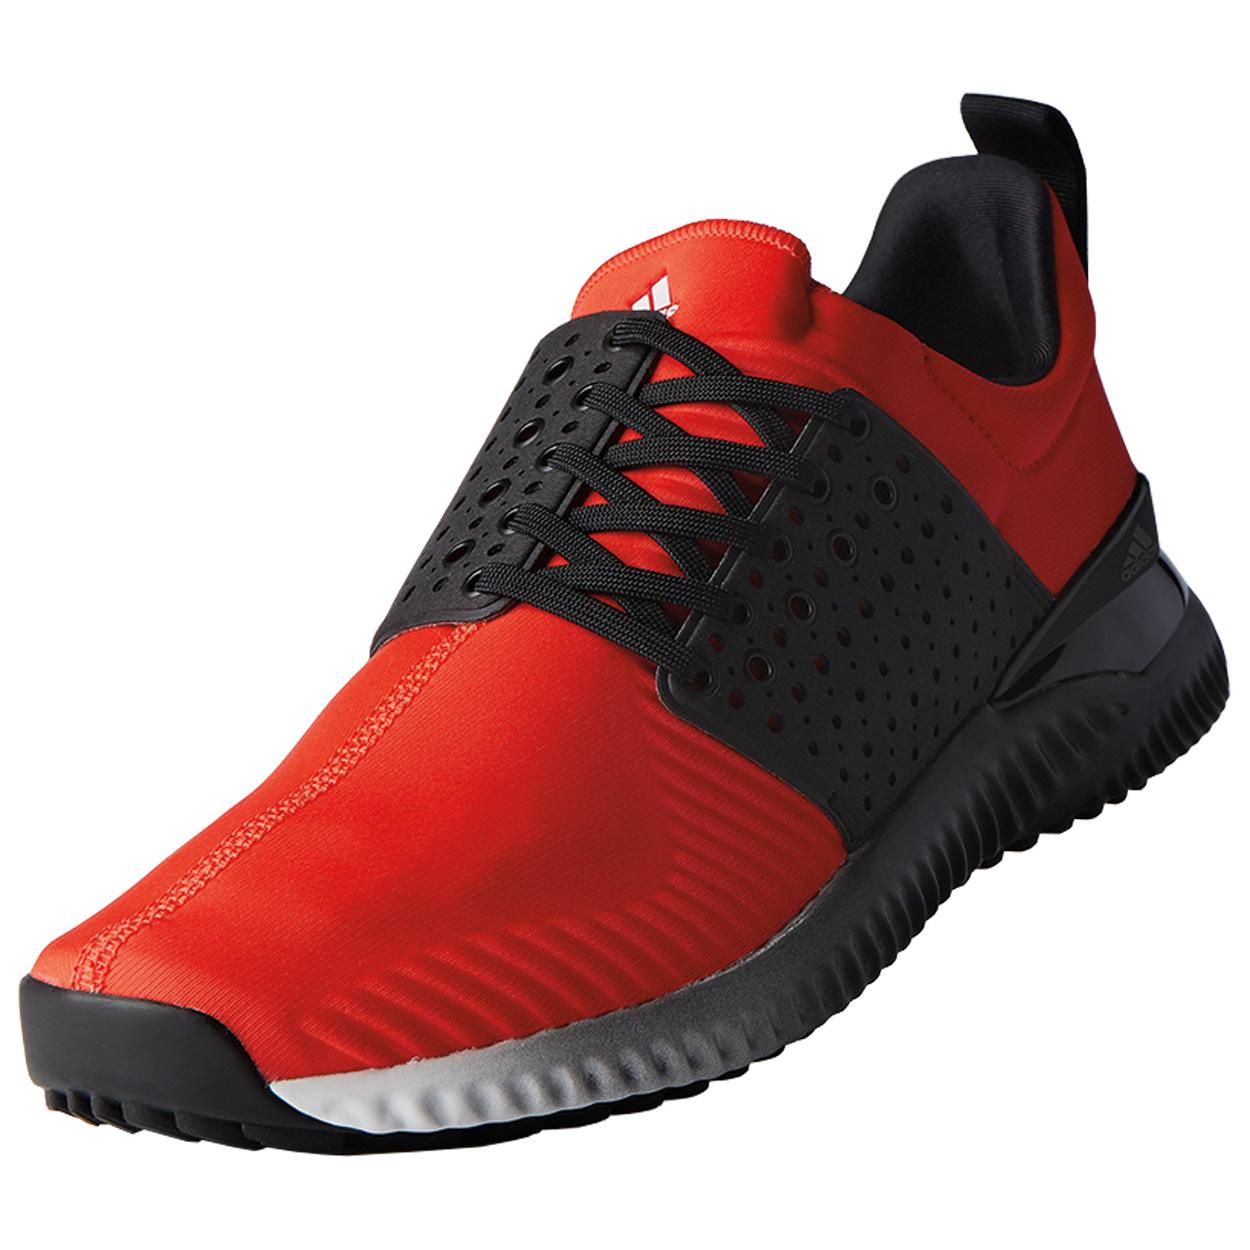 Adidas Adicross Bounce Golf Shoe